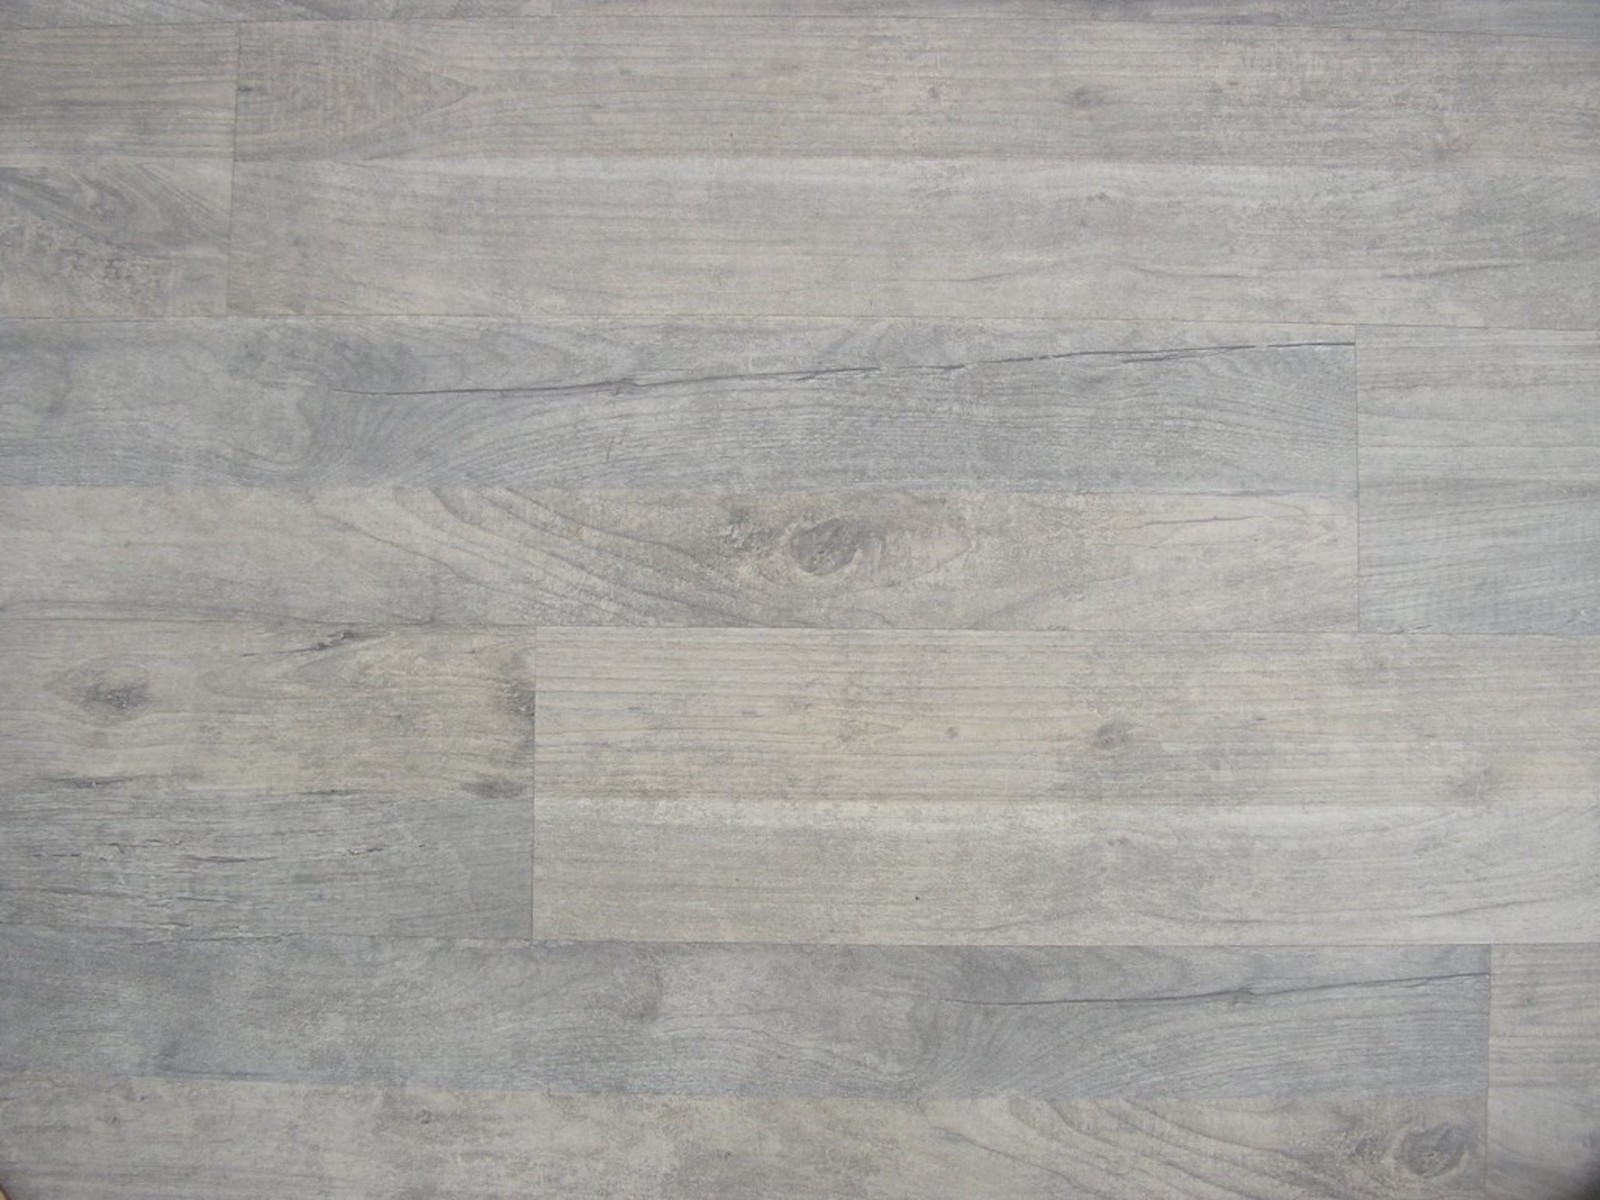 Parquet Grigio - Texture - Download - C4Dzone